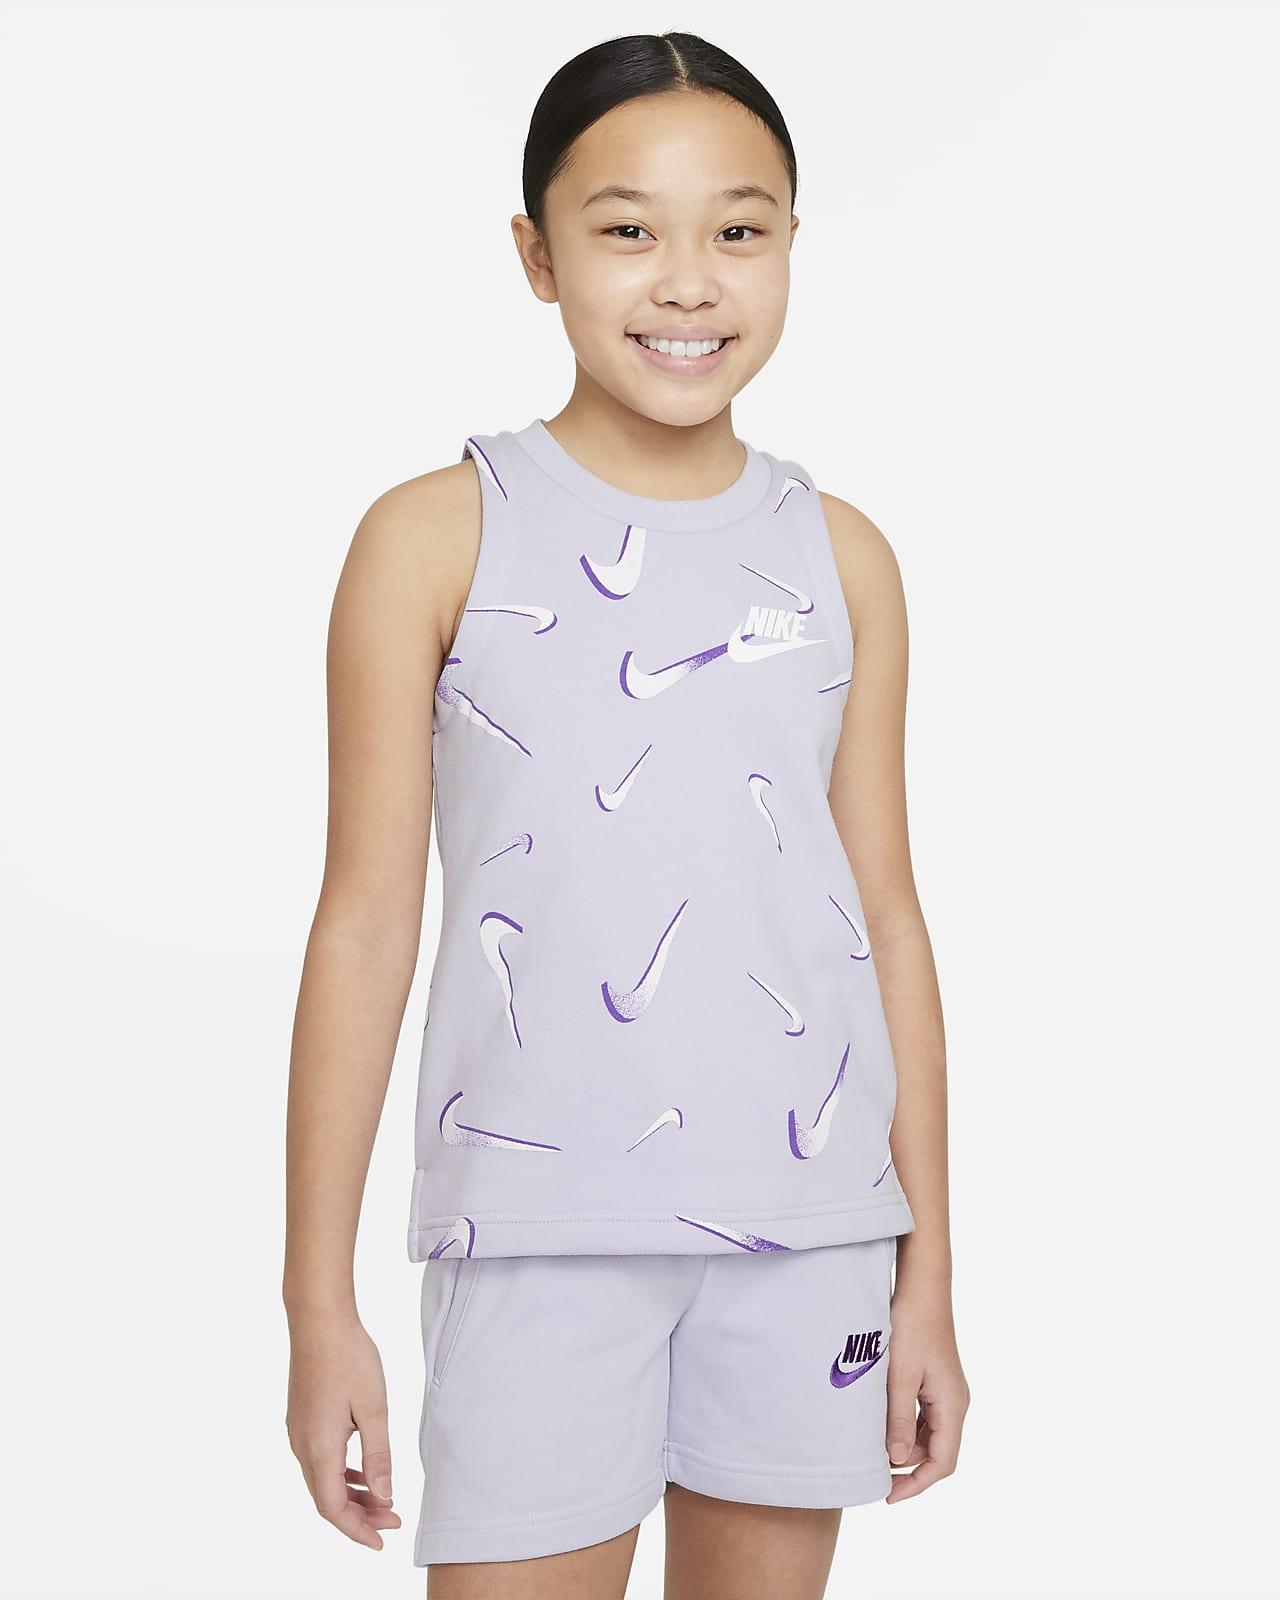 Nike Sportswear Older Kids' (Girls') French Terry Printed Tank